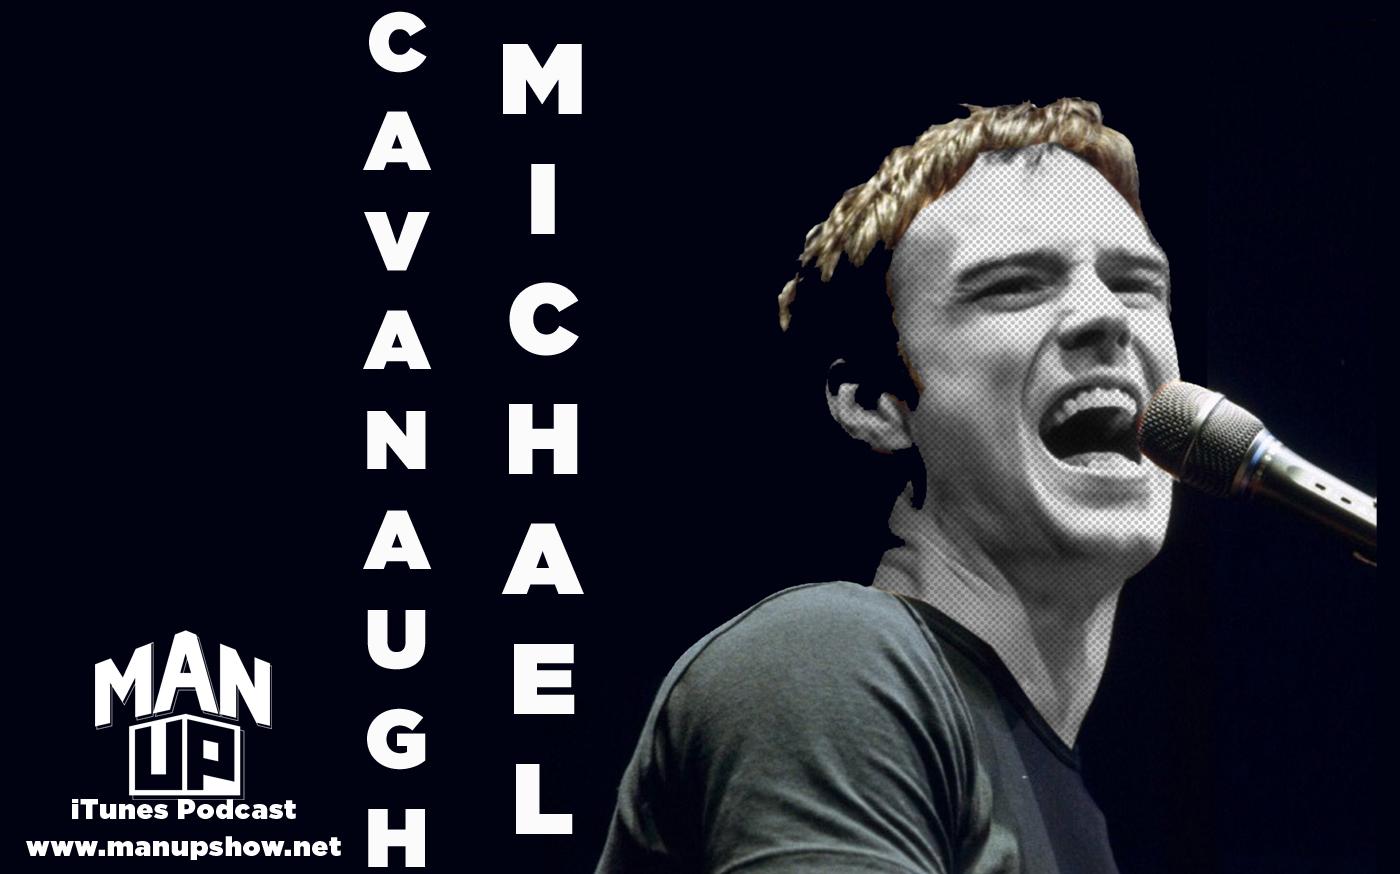 Man Up Episode 025 Michael Cavanaugh